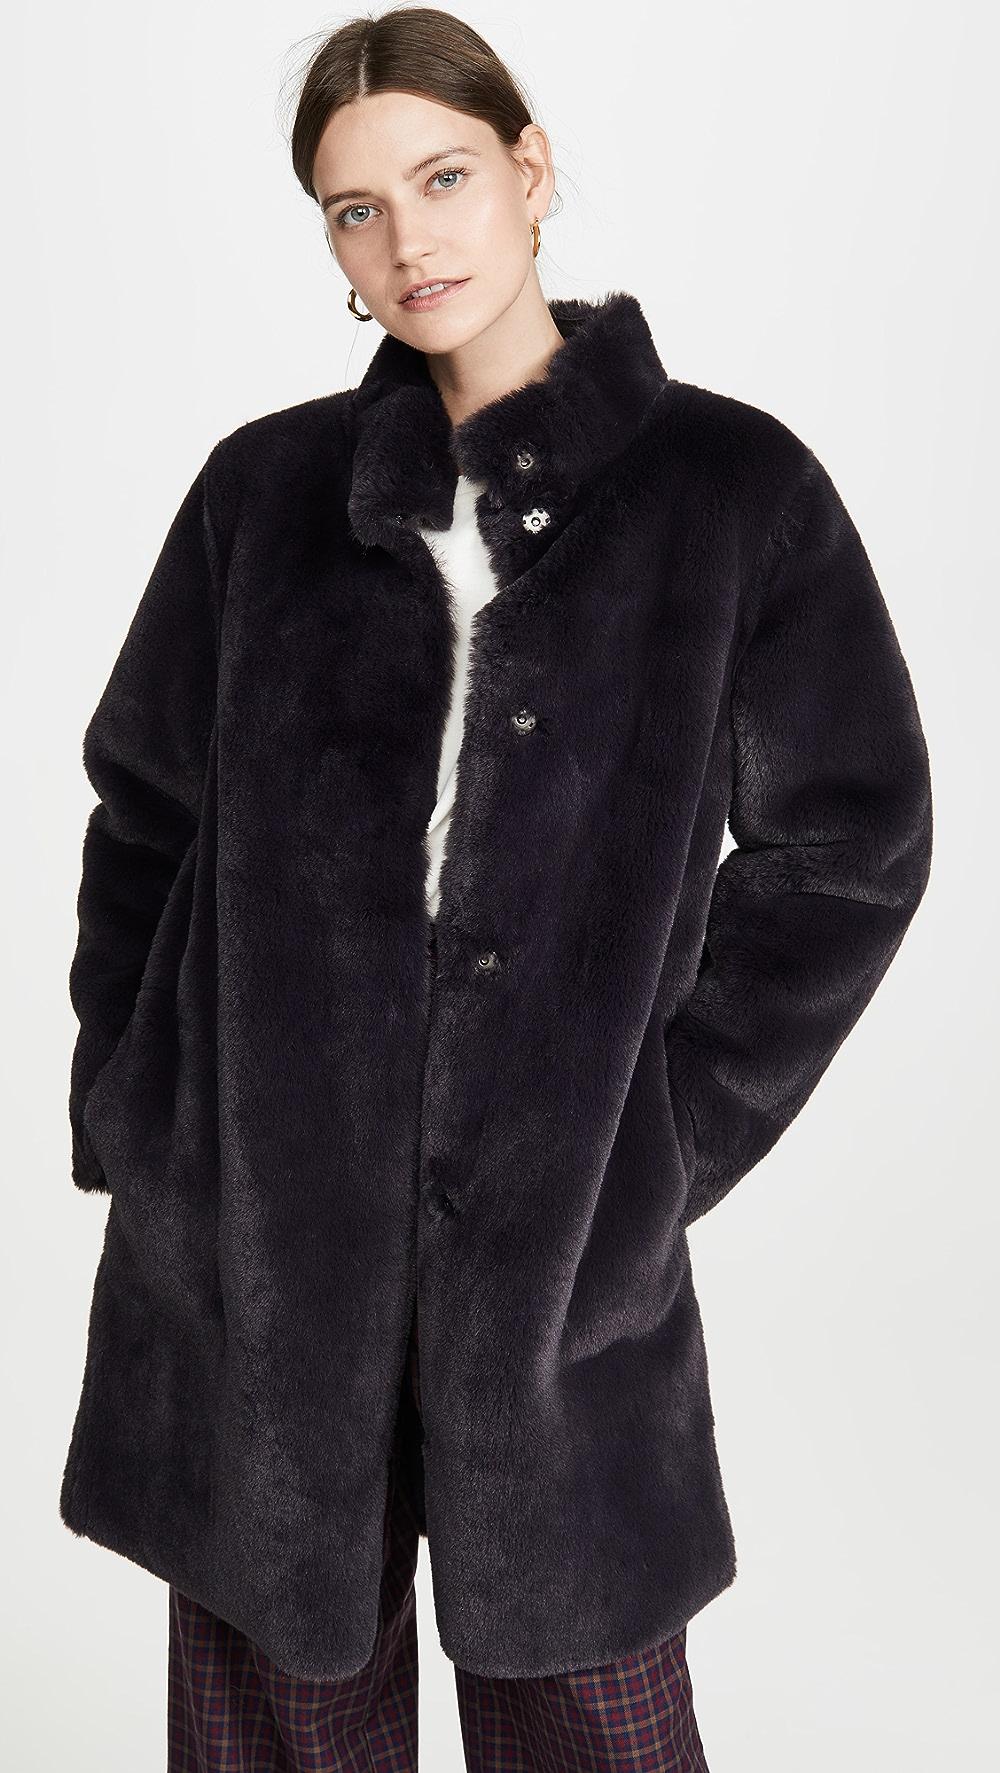 Smart Velvet - Mina Coat High Quality And Inexpensive